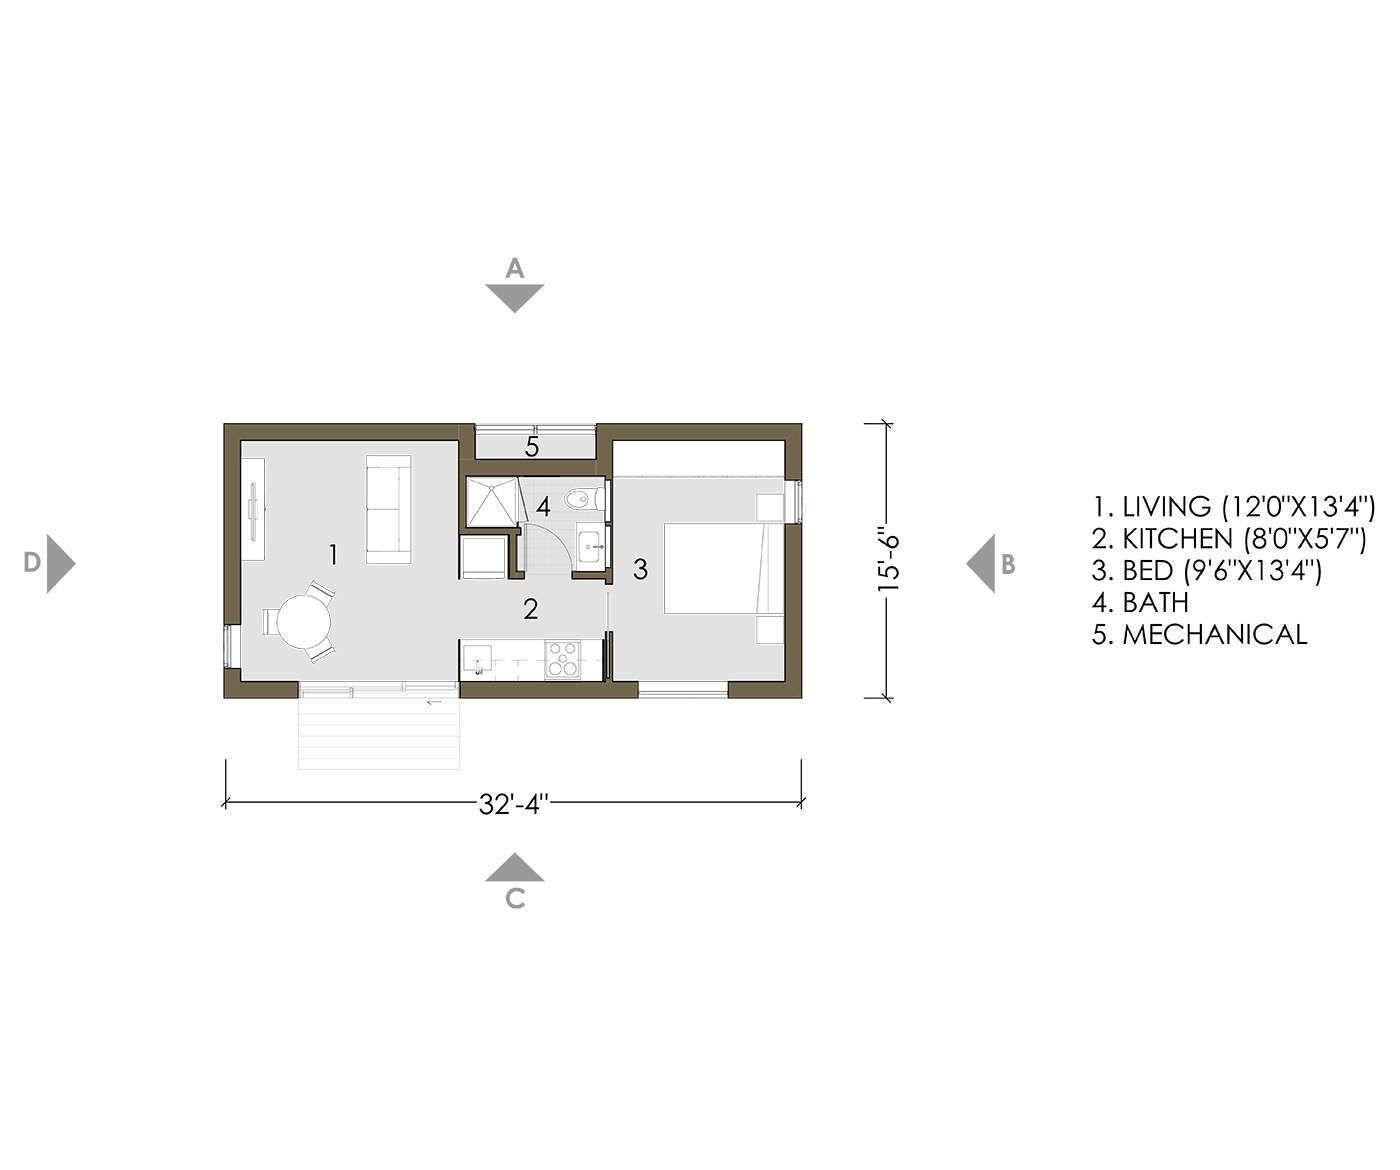 Typical plan of an ADU